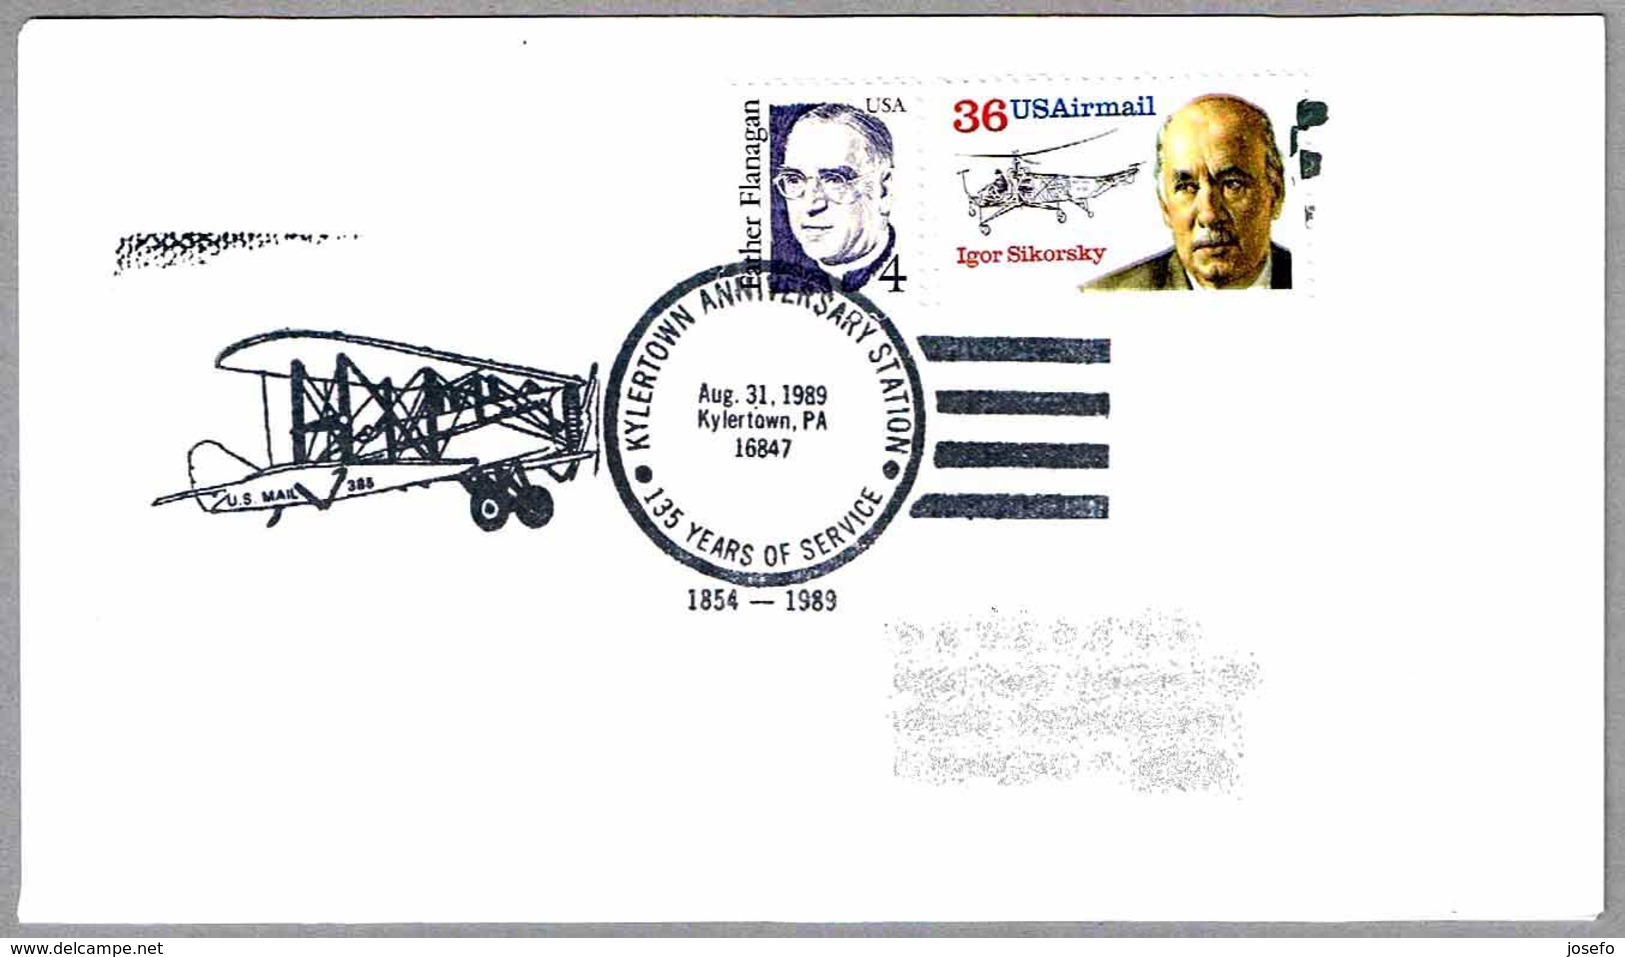 KYLERTOWN ANNIVERSARY - 135 YEARS OF SERVICE - U.S.MAIL. Kylertown PA 1989 - Correo Postal